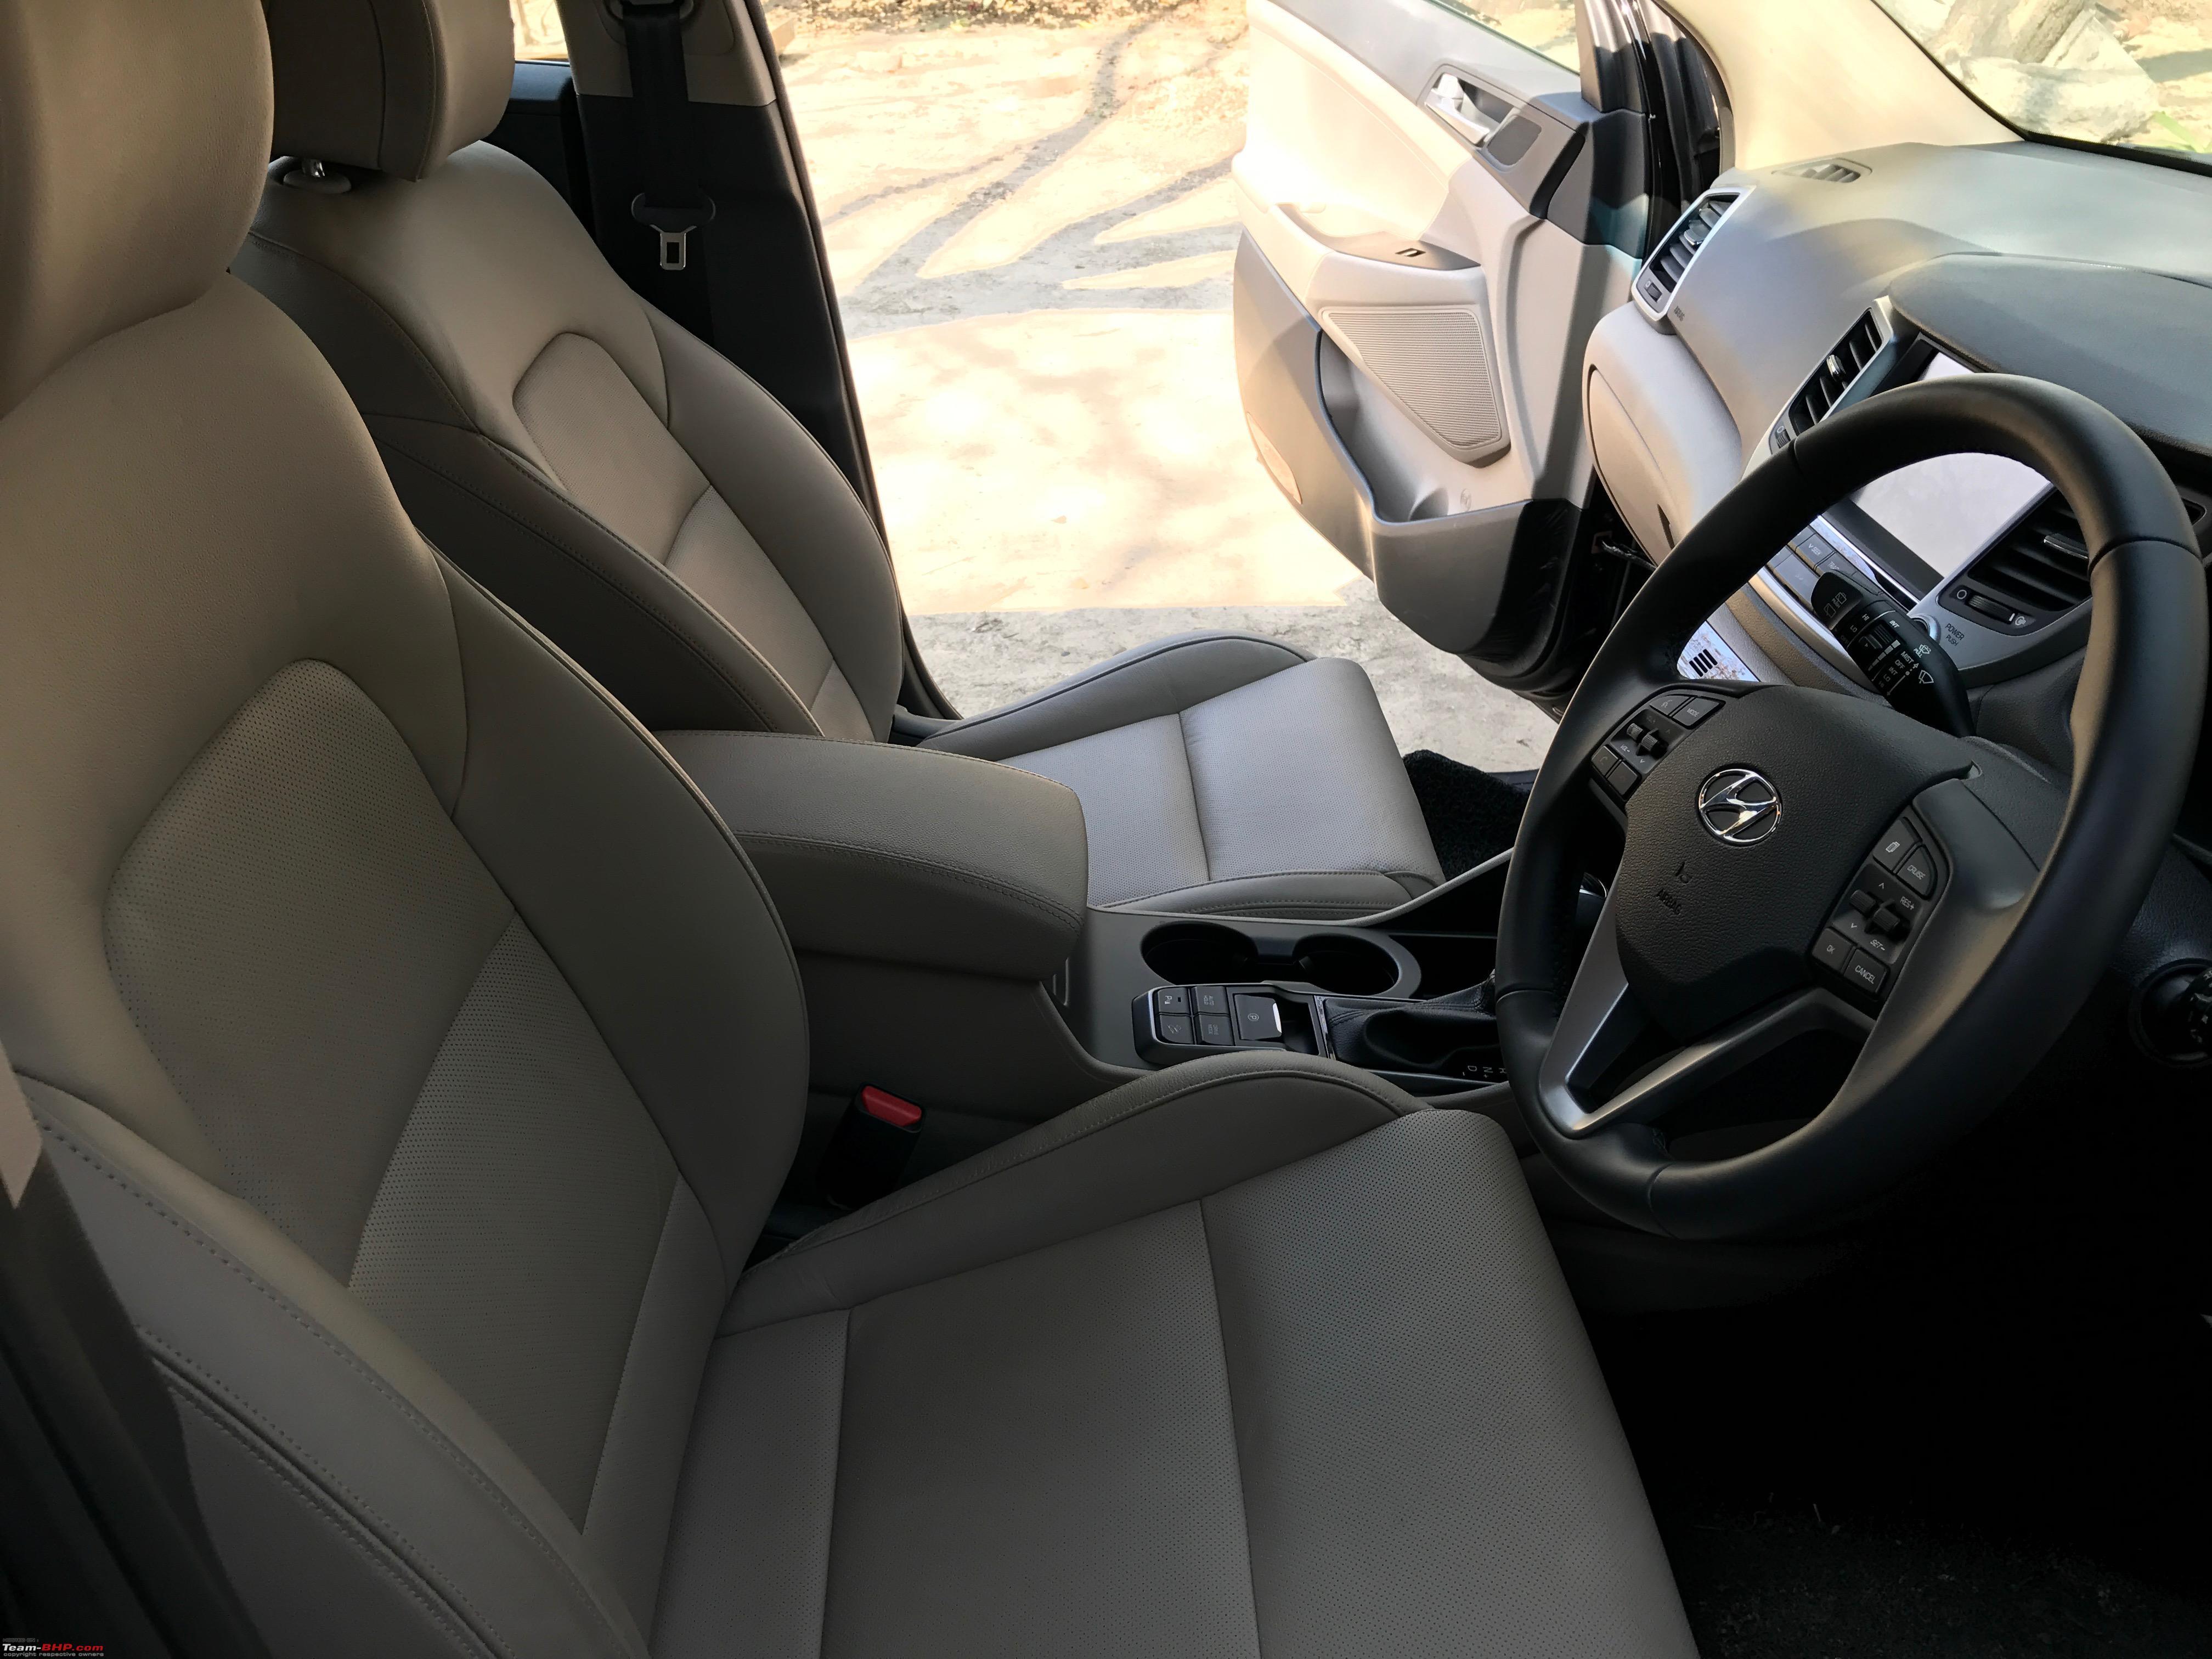 madison auto pzev se vehicle hyundai elantra ltd details avail